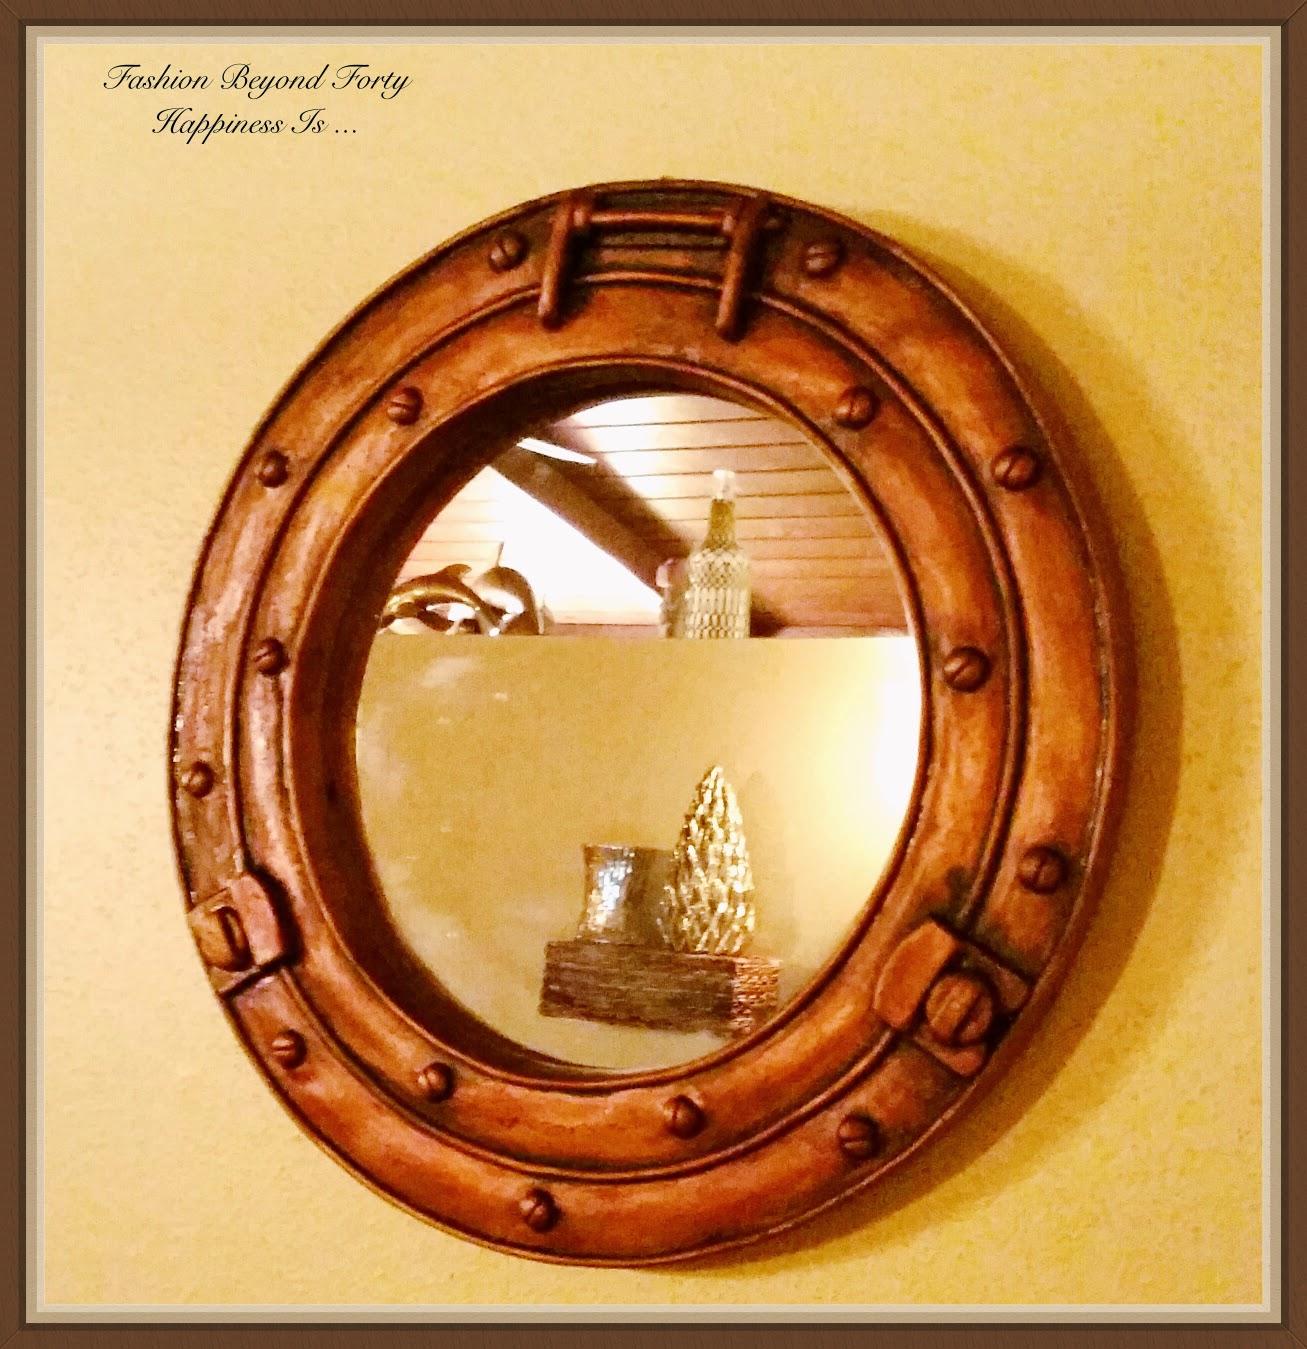 Porthole Mirror from Oriental Trading Company